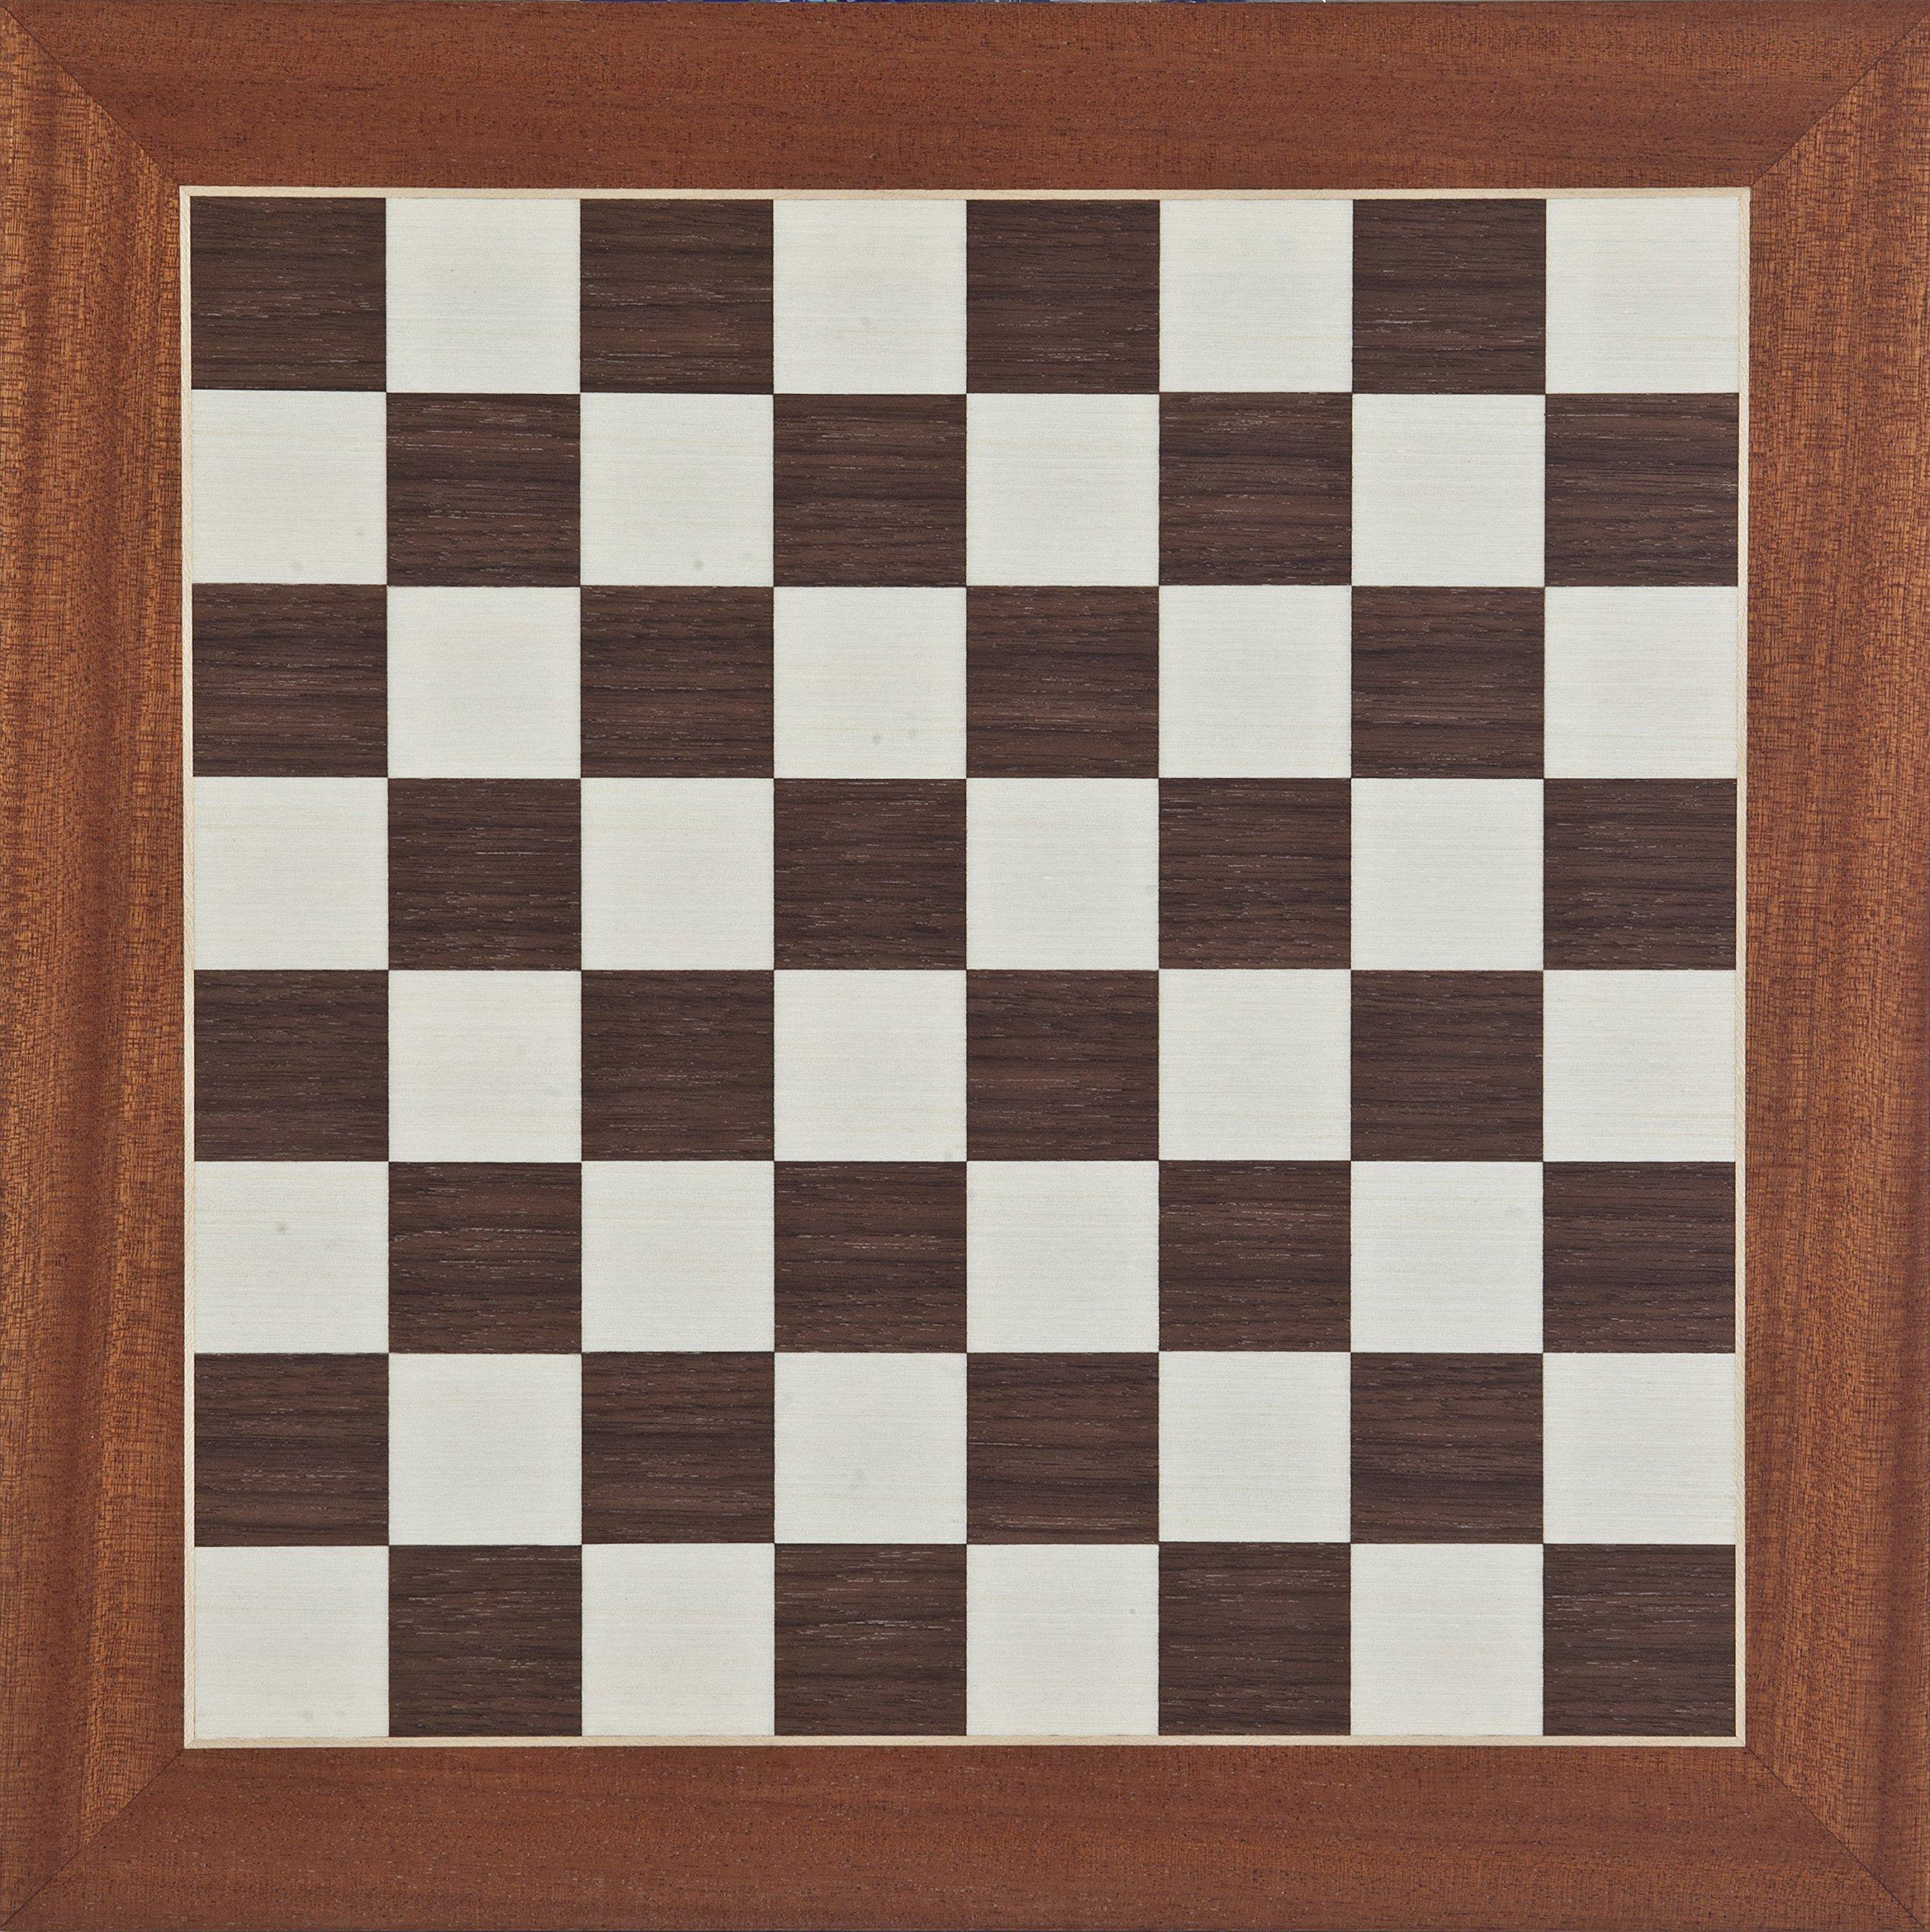 American West Chessmen & Stuyvesant Street Chess Board from Spain